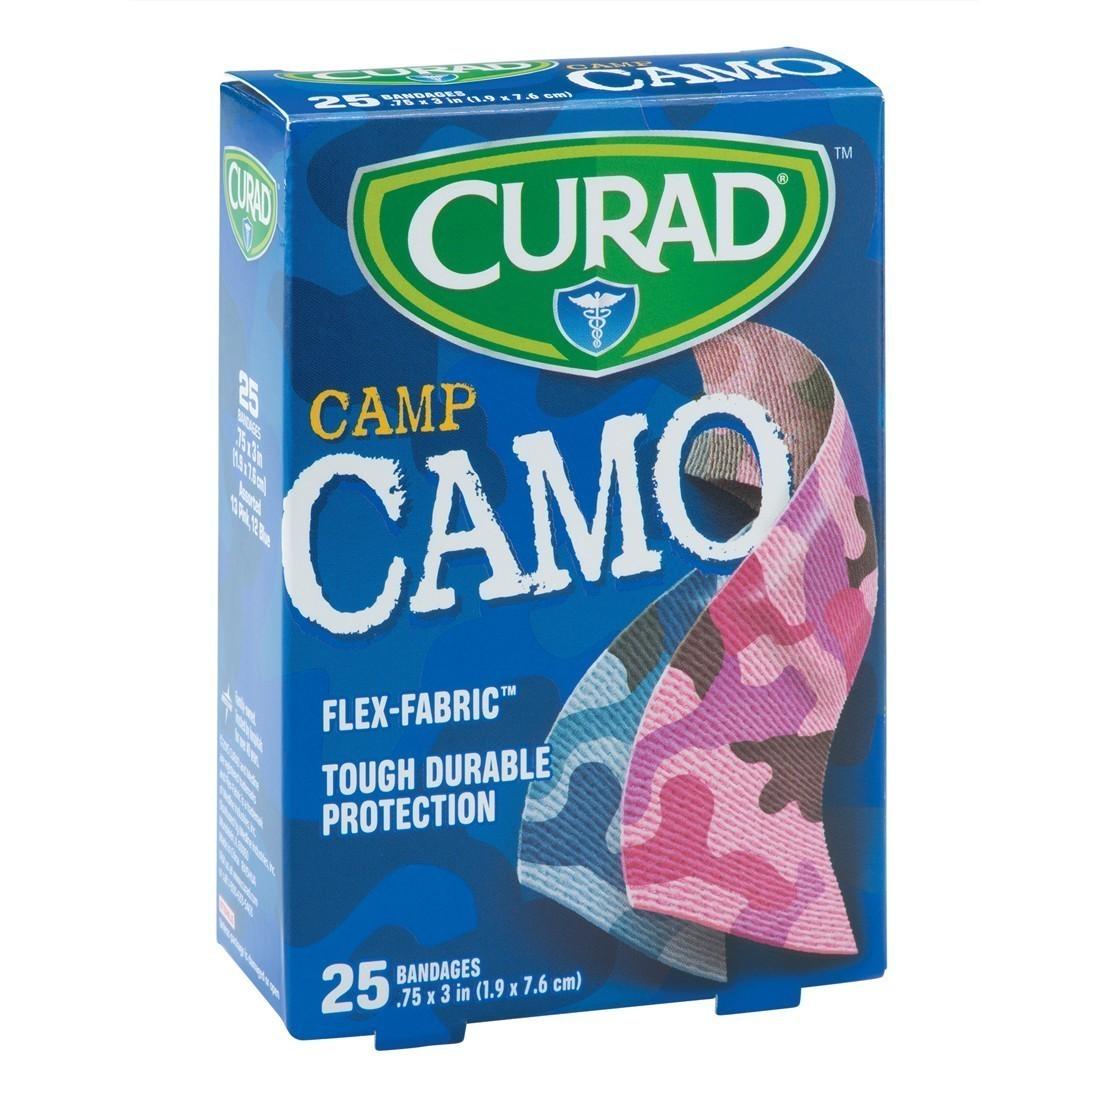 Curad® Case Pink/Blue Fabric Camo Bandages [image]